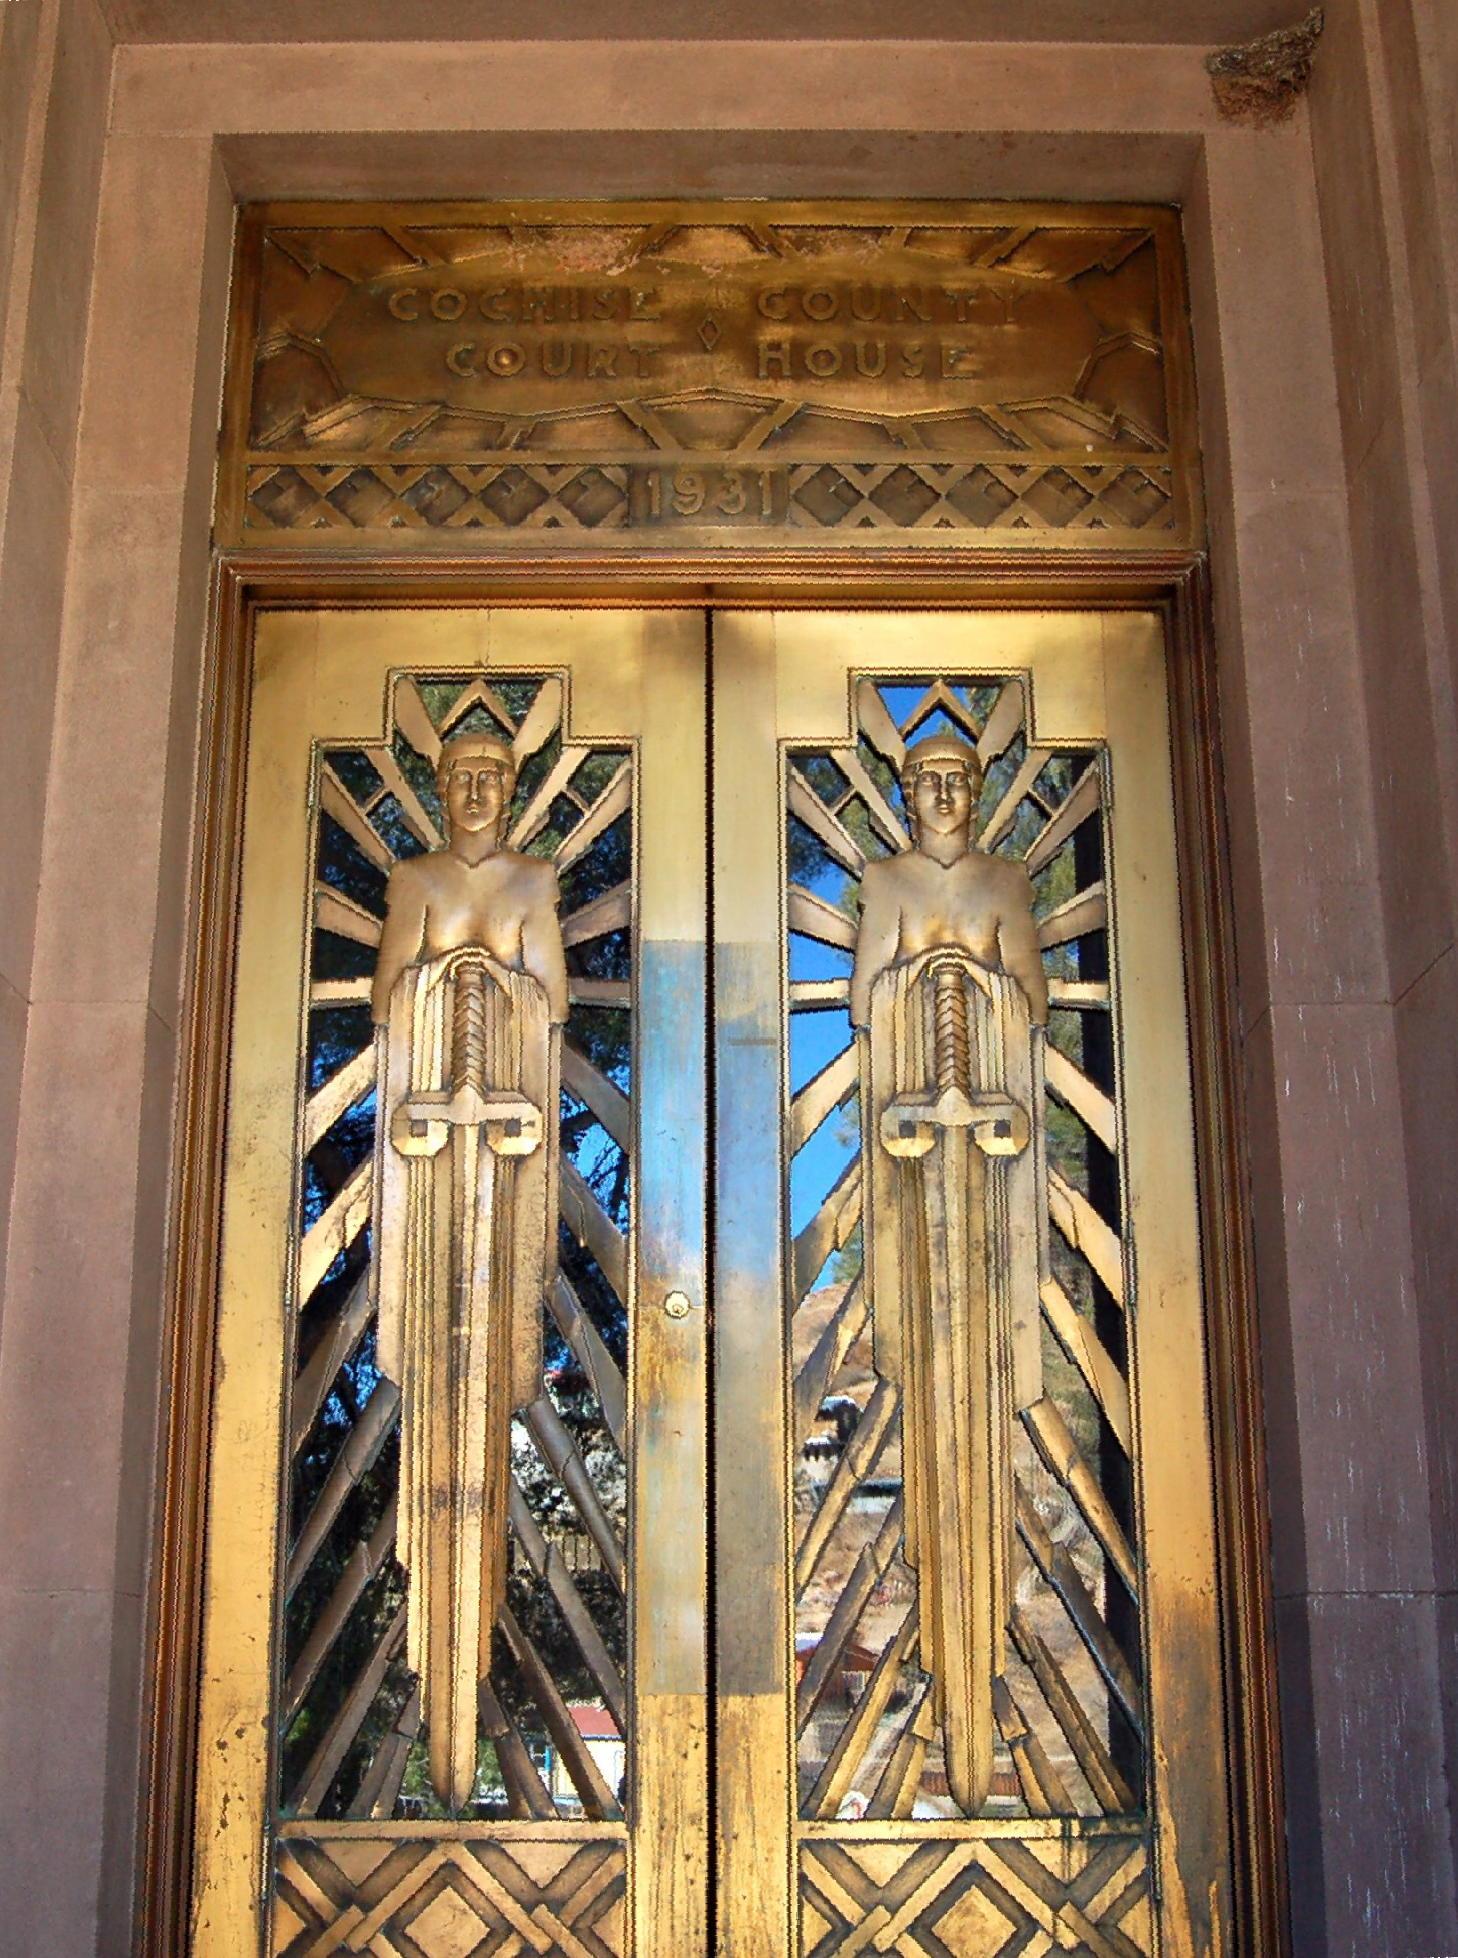 FileCochise County Courthouse Bisbee Arizona ArtDecoDoors.jpg & File:Cochise County Courthouse Bisbee Arizona ArtDecoDoors.jpg ...